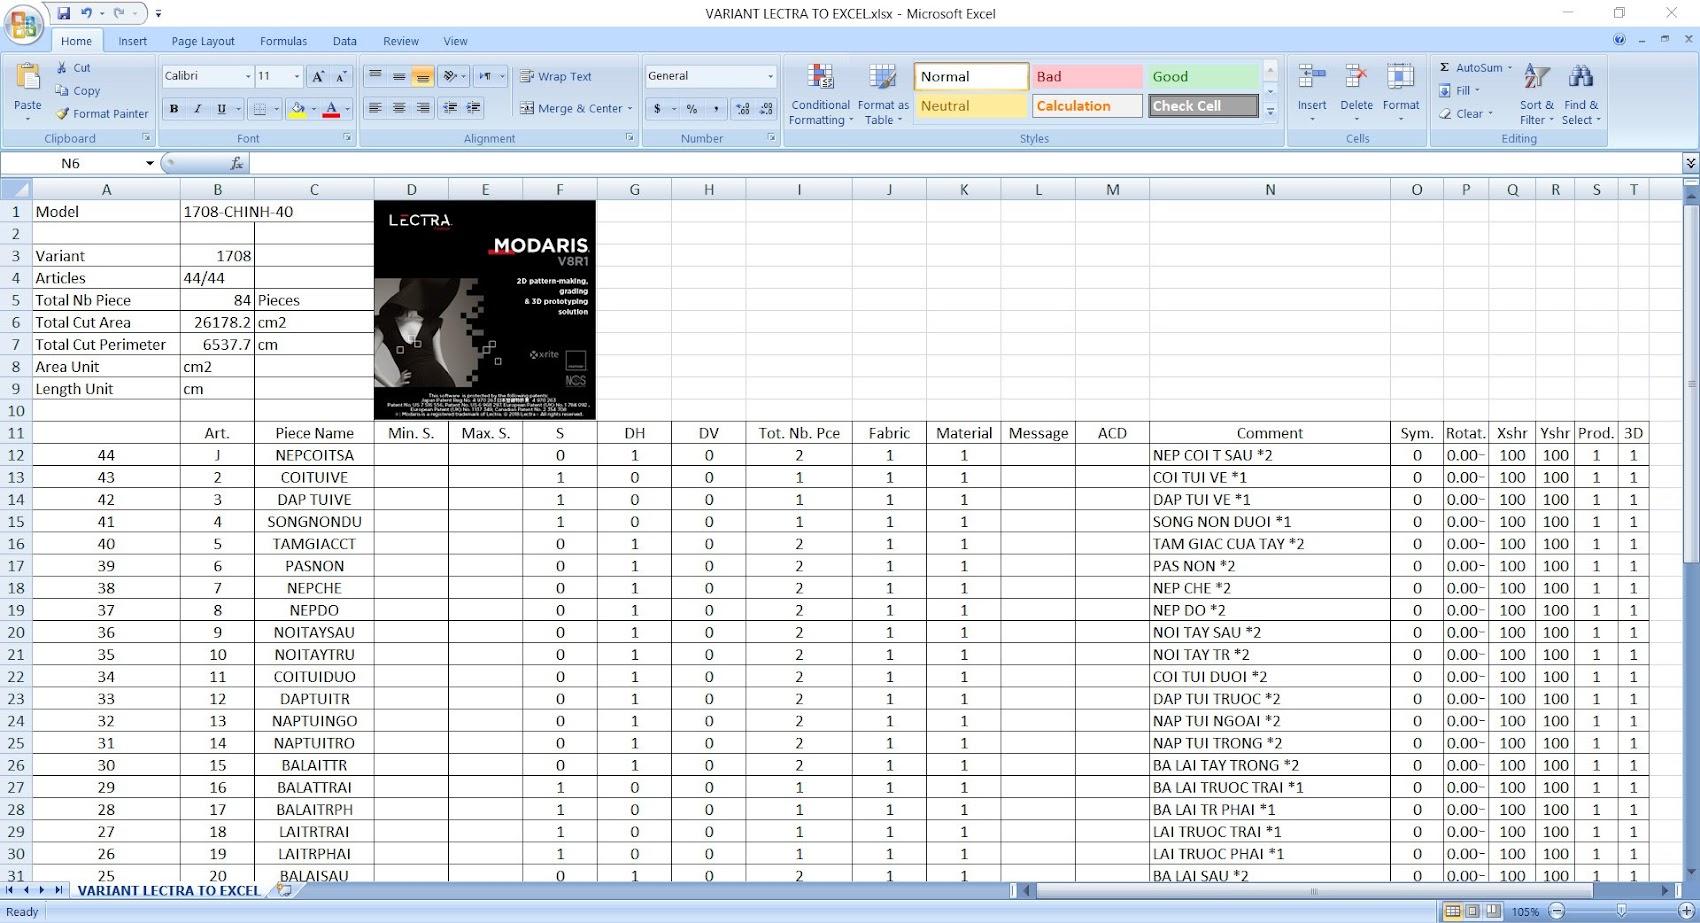 Hướng Dẫn Export Variant Lectra Modaris To Excel 1